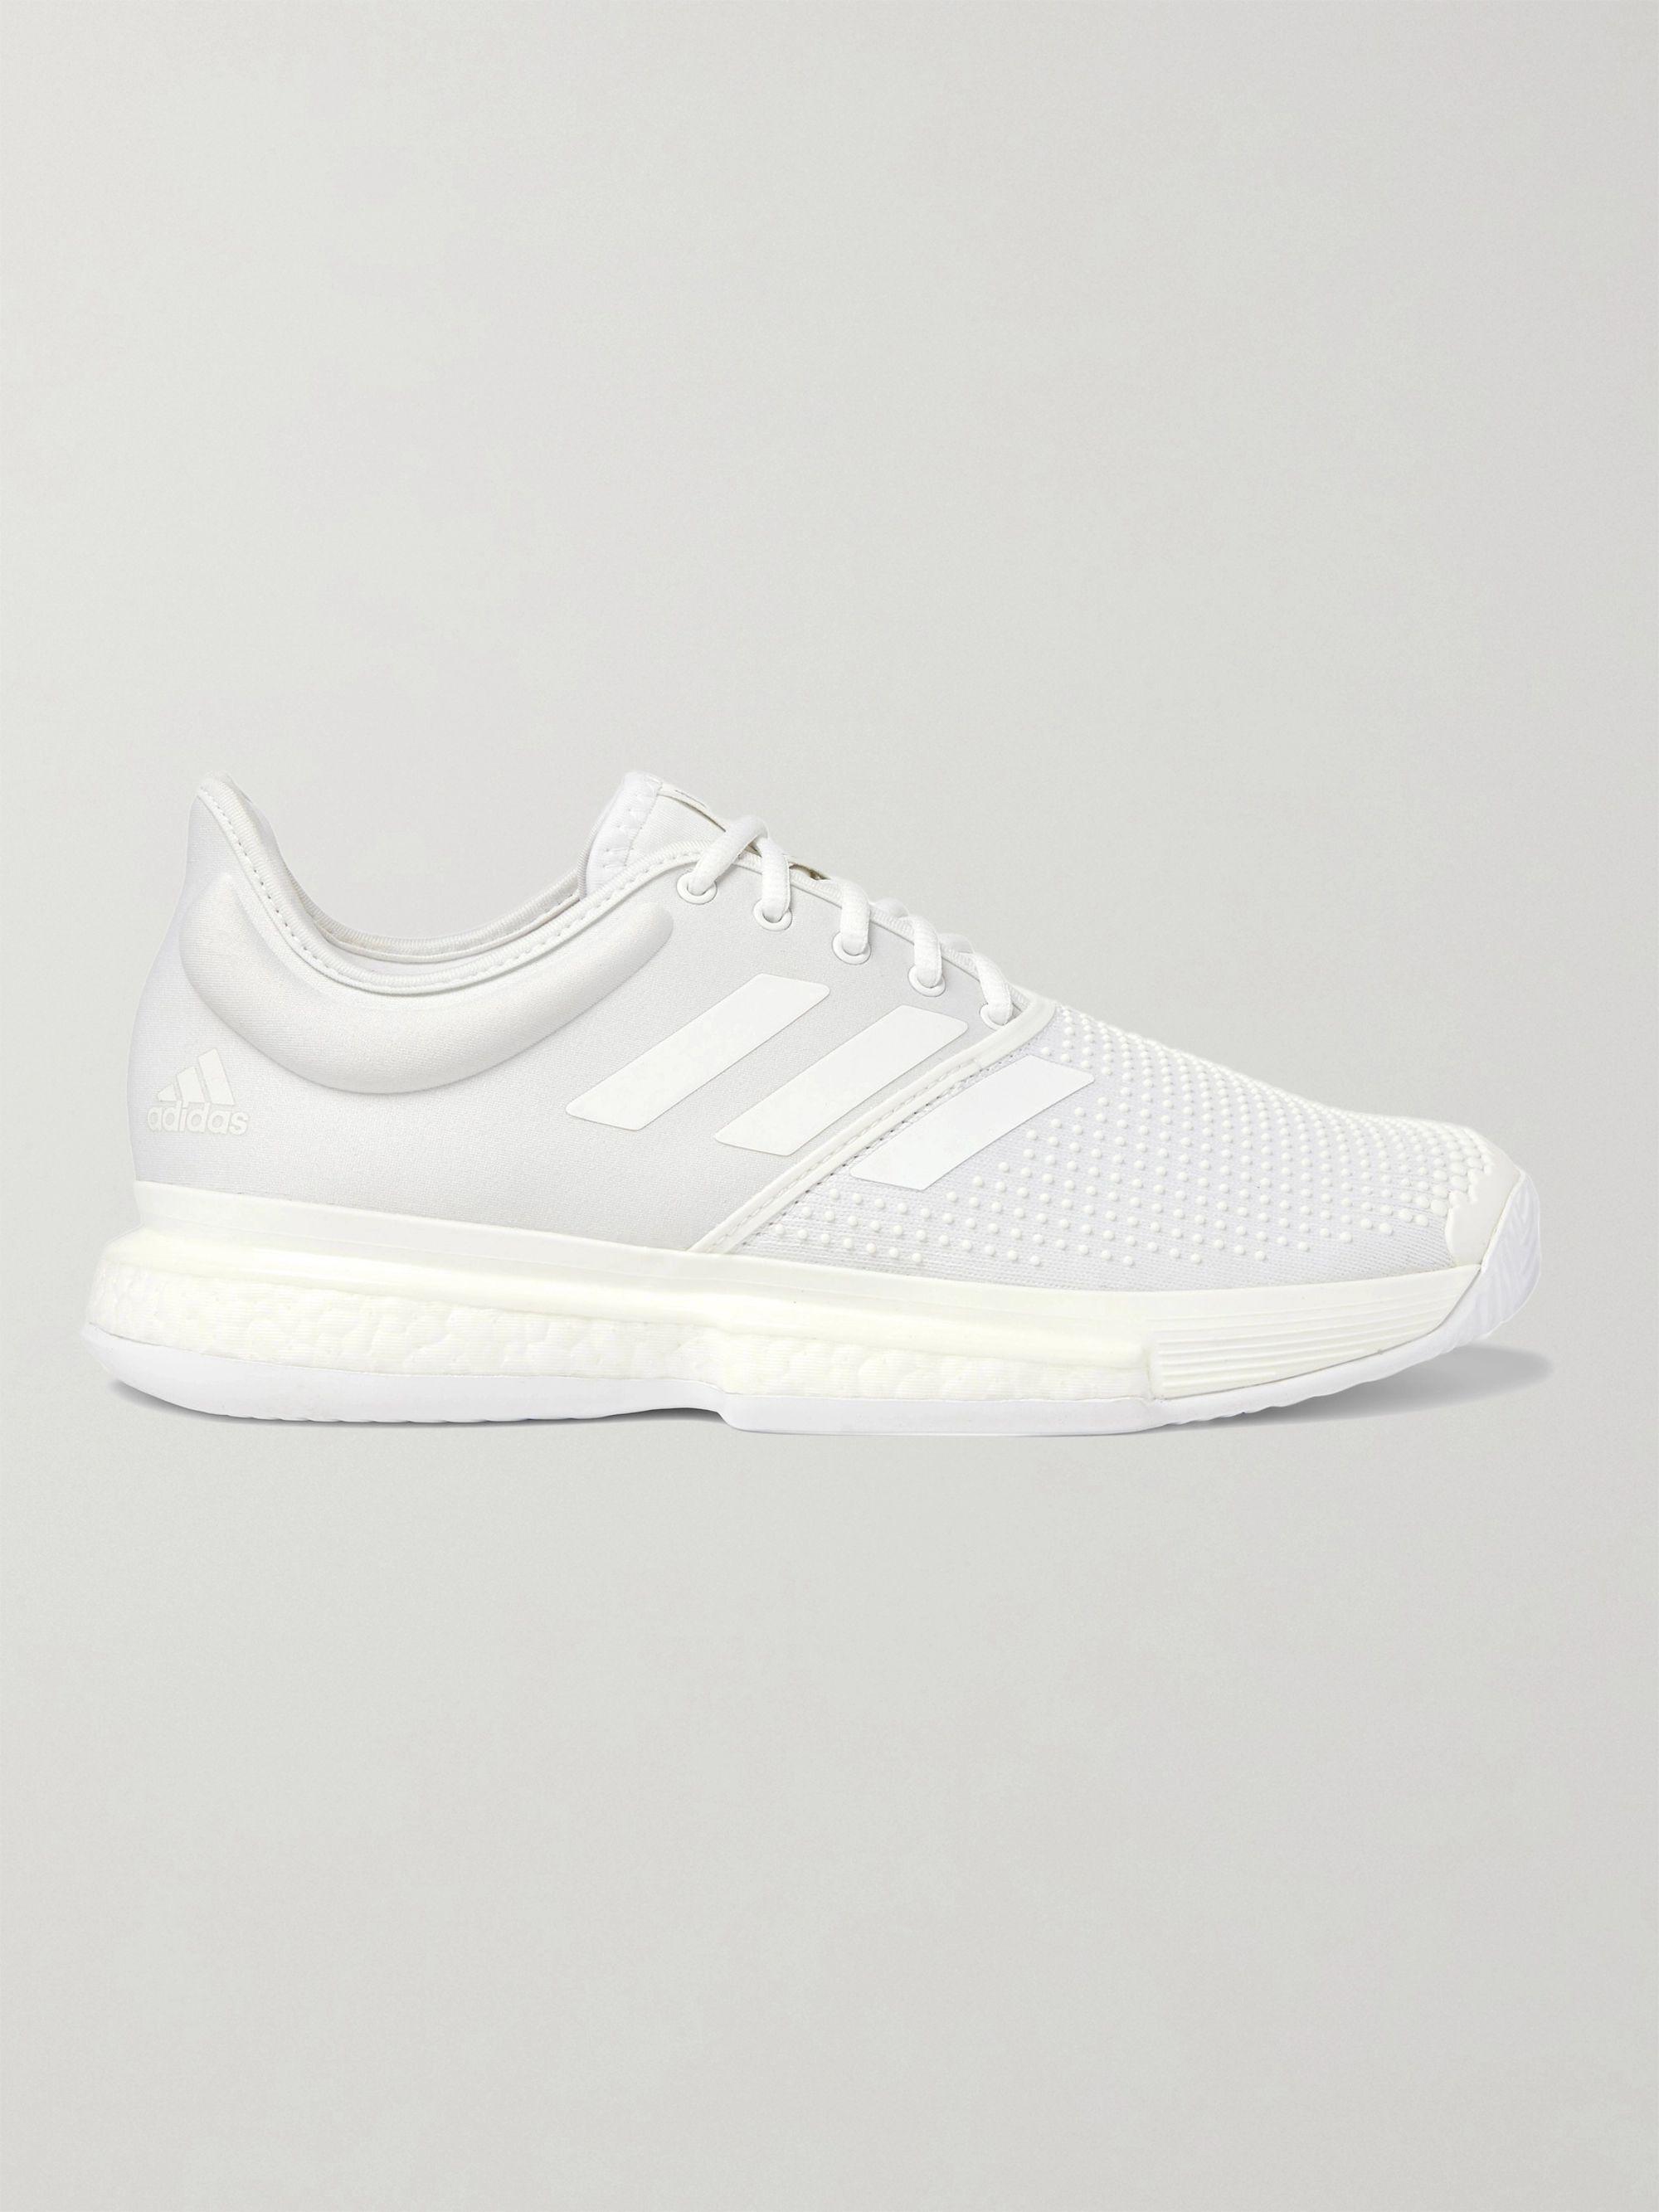 + Parley Sole Court Boost Neoprene Sneakers